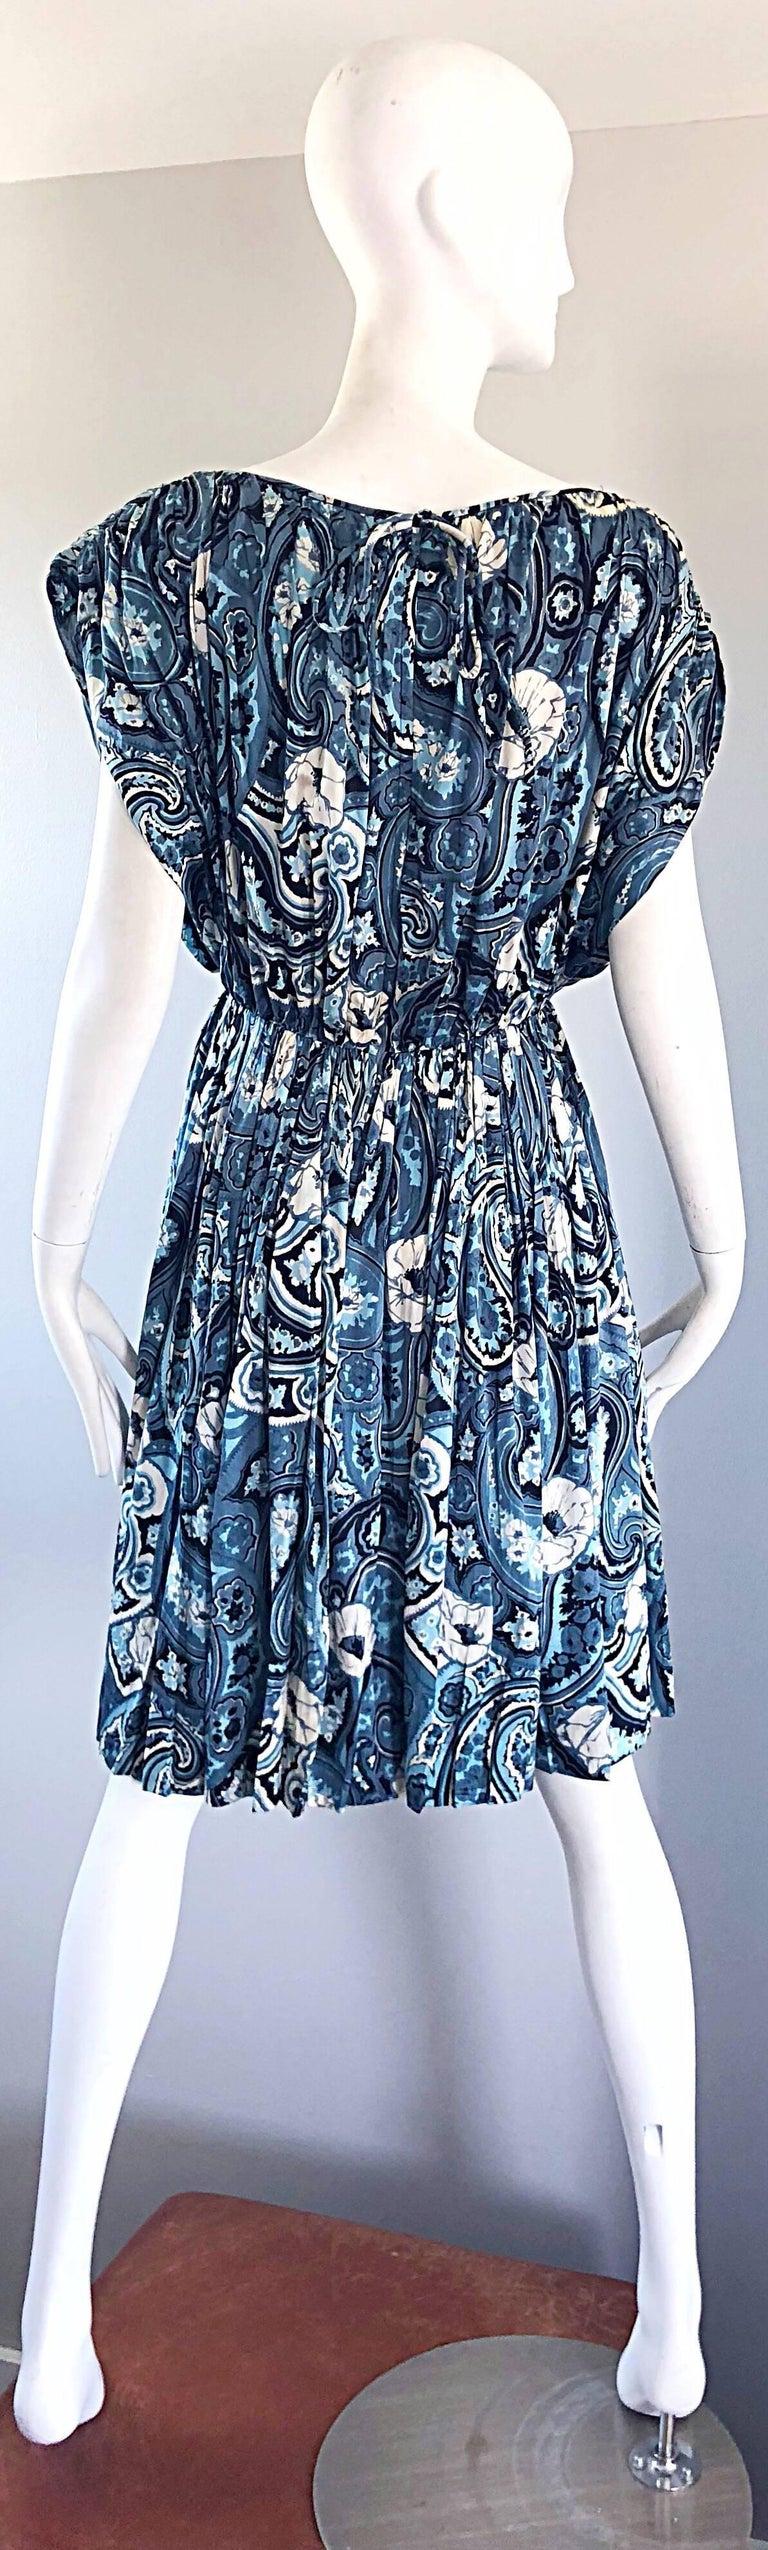 Rare 1950s Townley Blue + White Paisley Flower Print Vintage 50s Dress For Sale 7